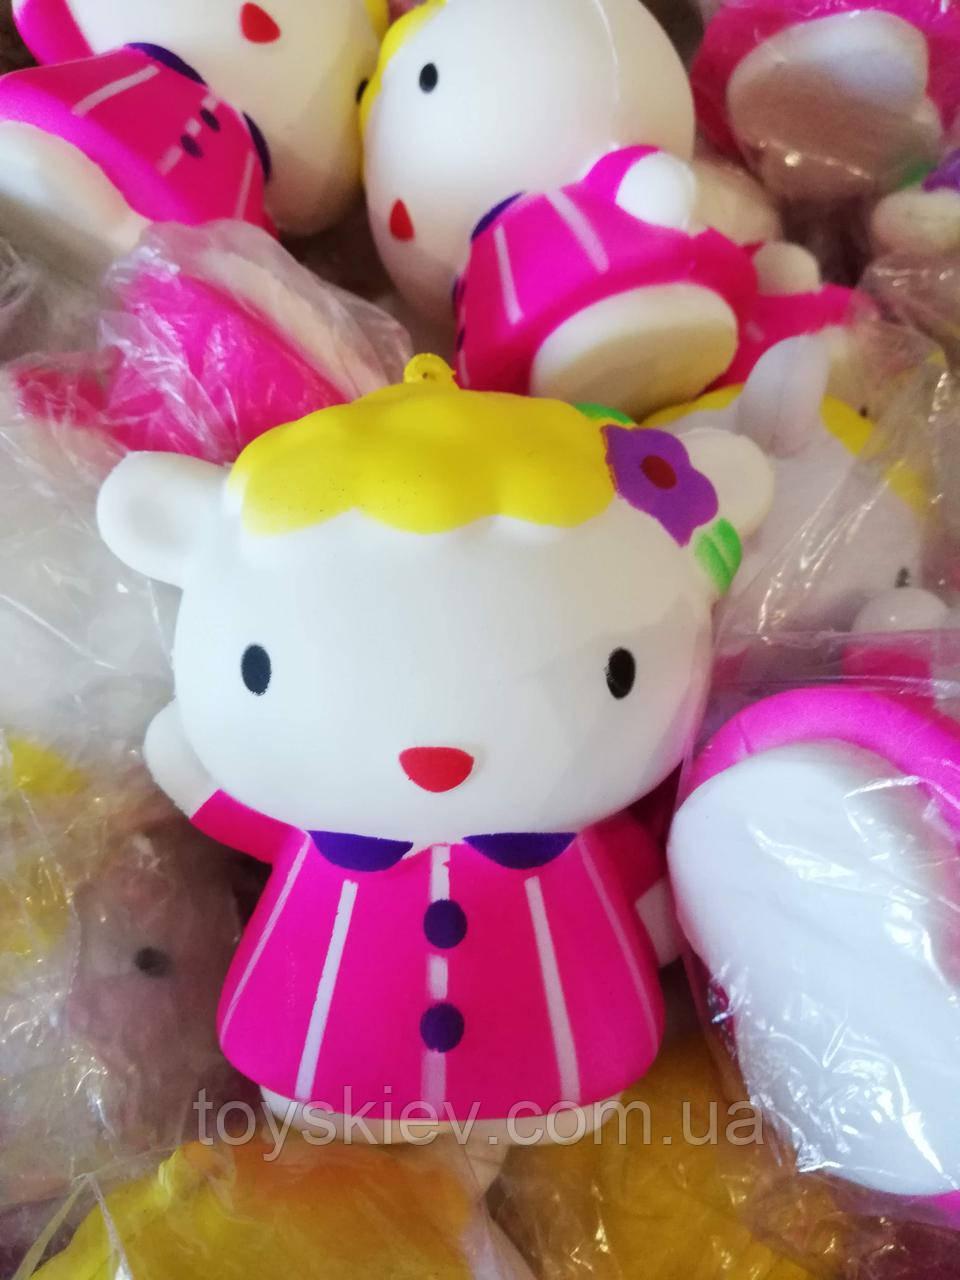 Сквиши SQUISHY куколка Сквиш Антистресс игрушка ароматная большая